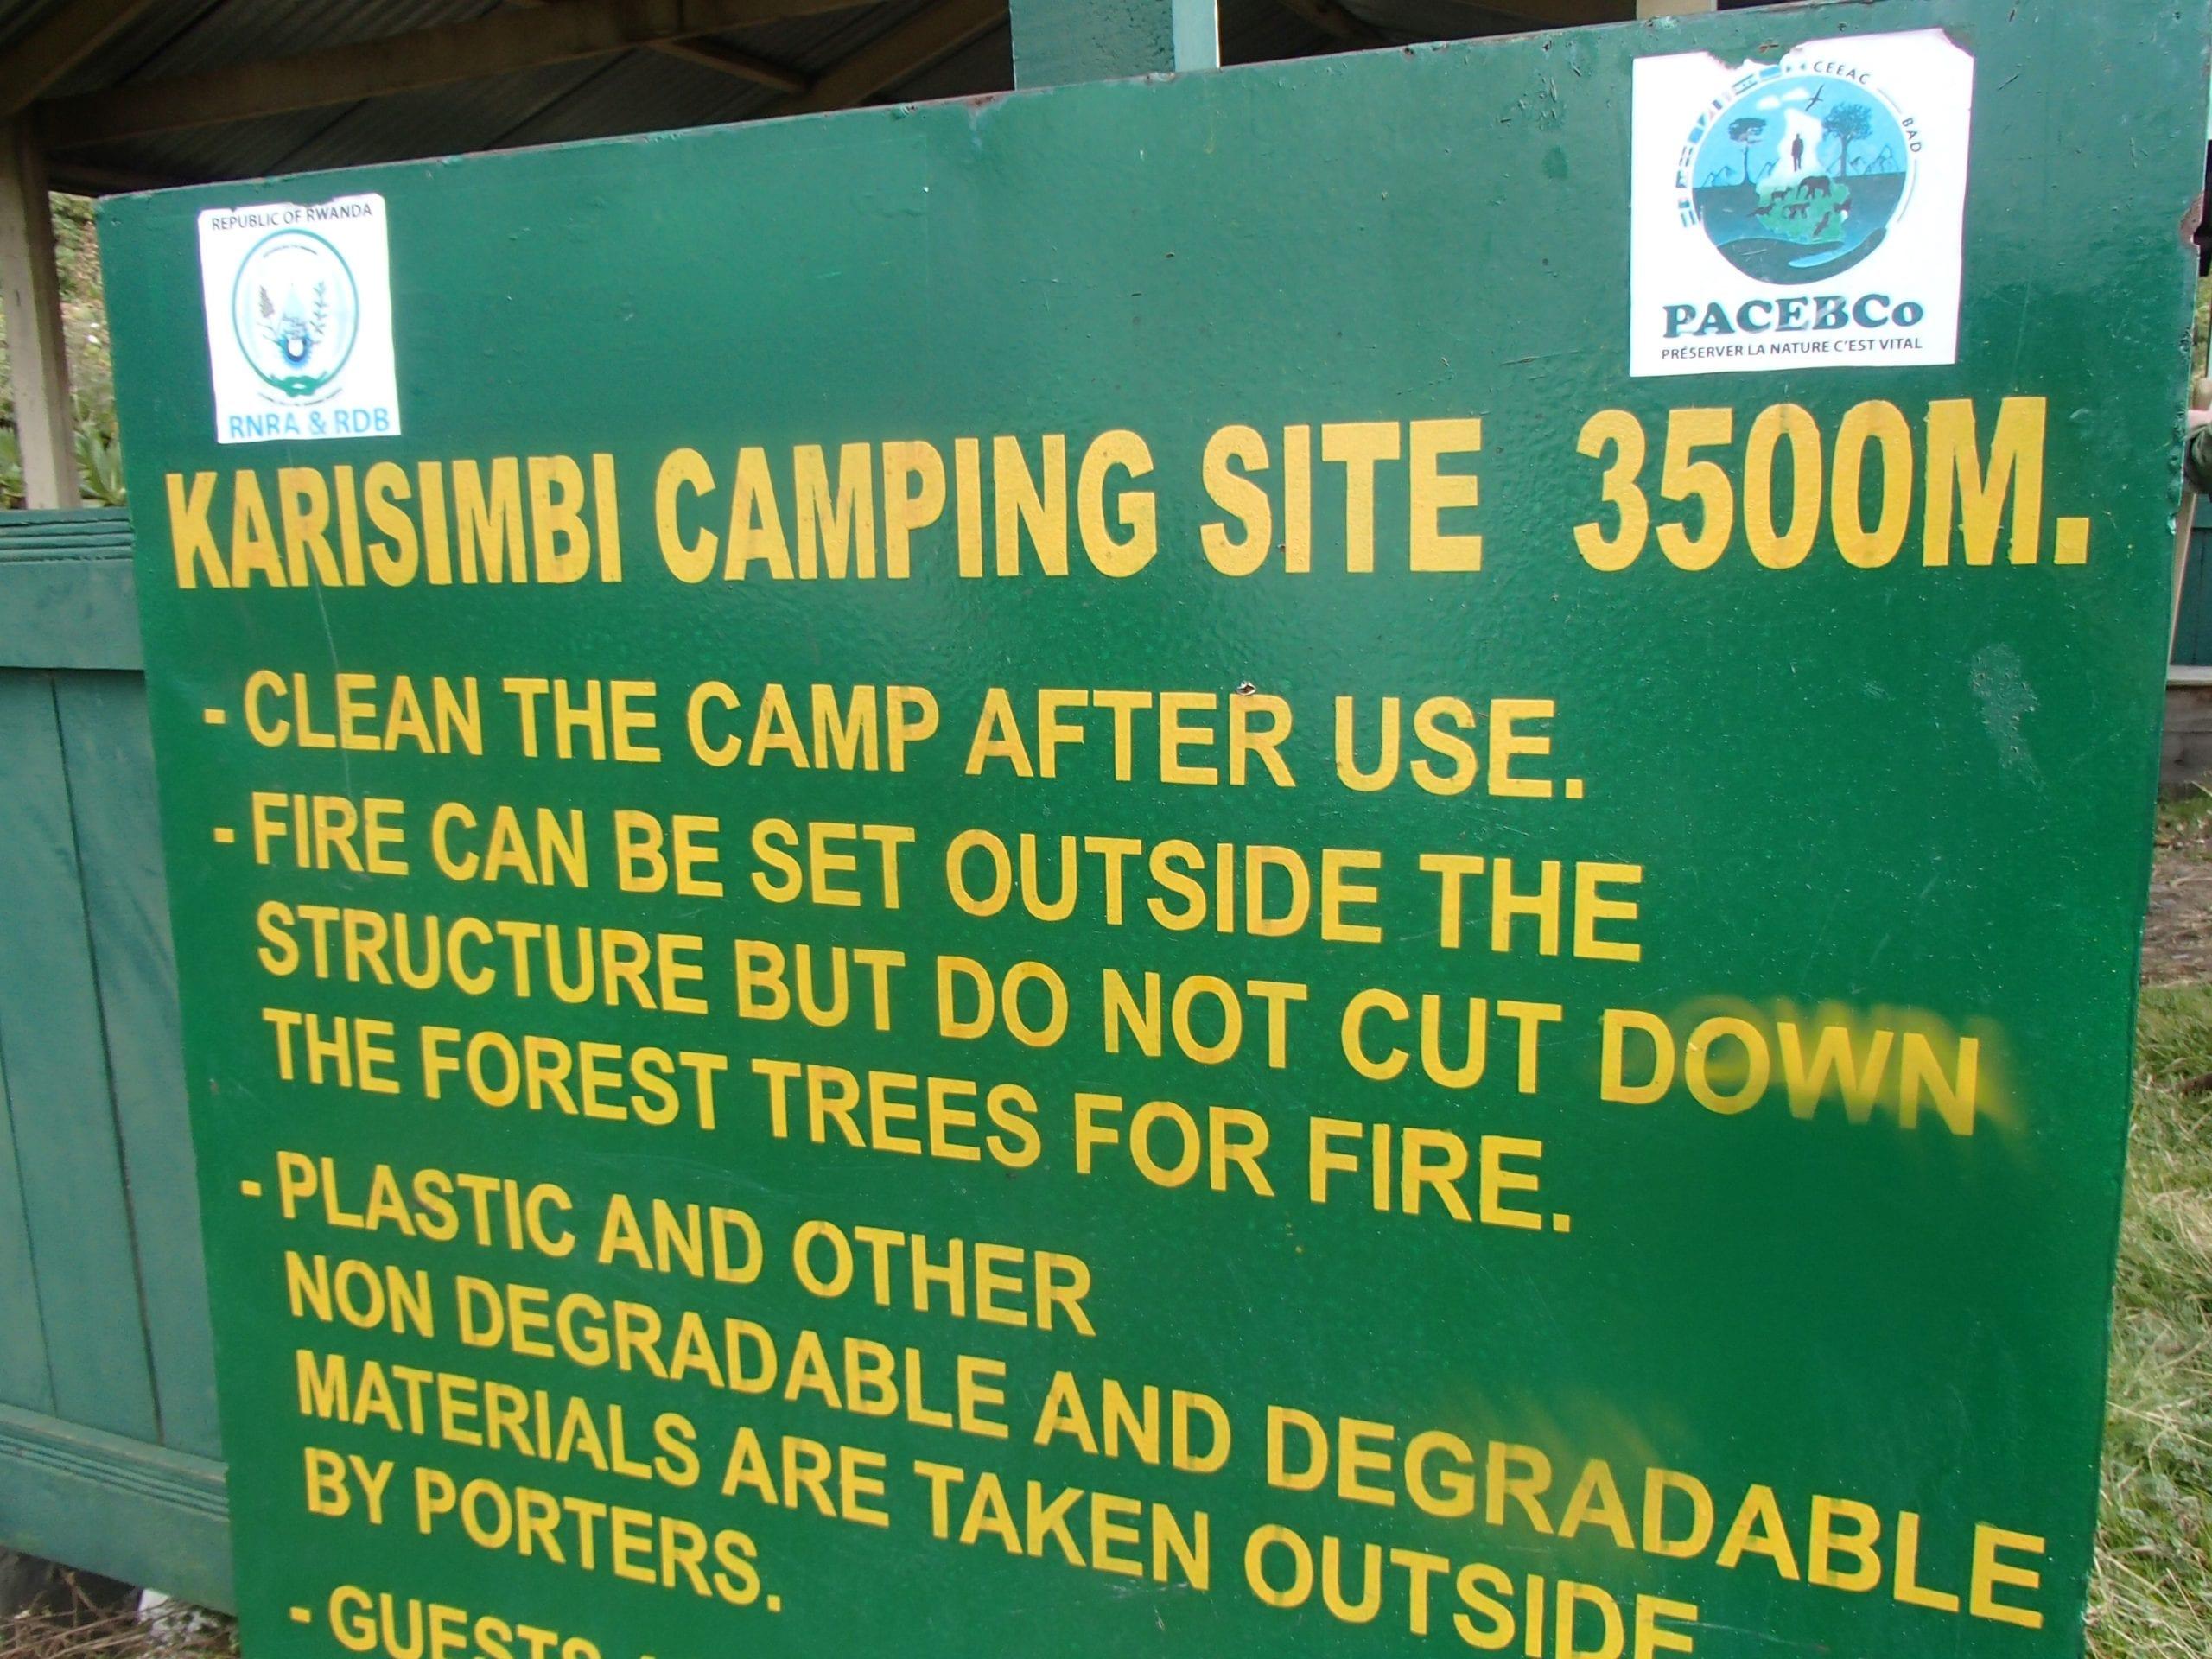 Karisimbi Camping Site